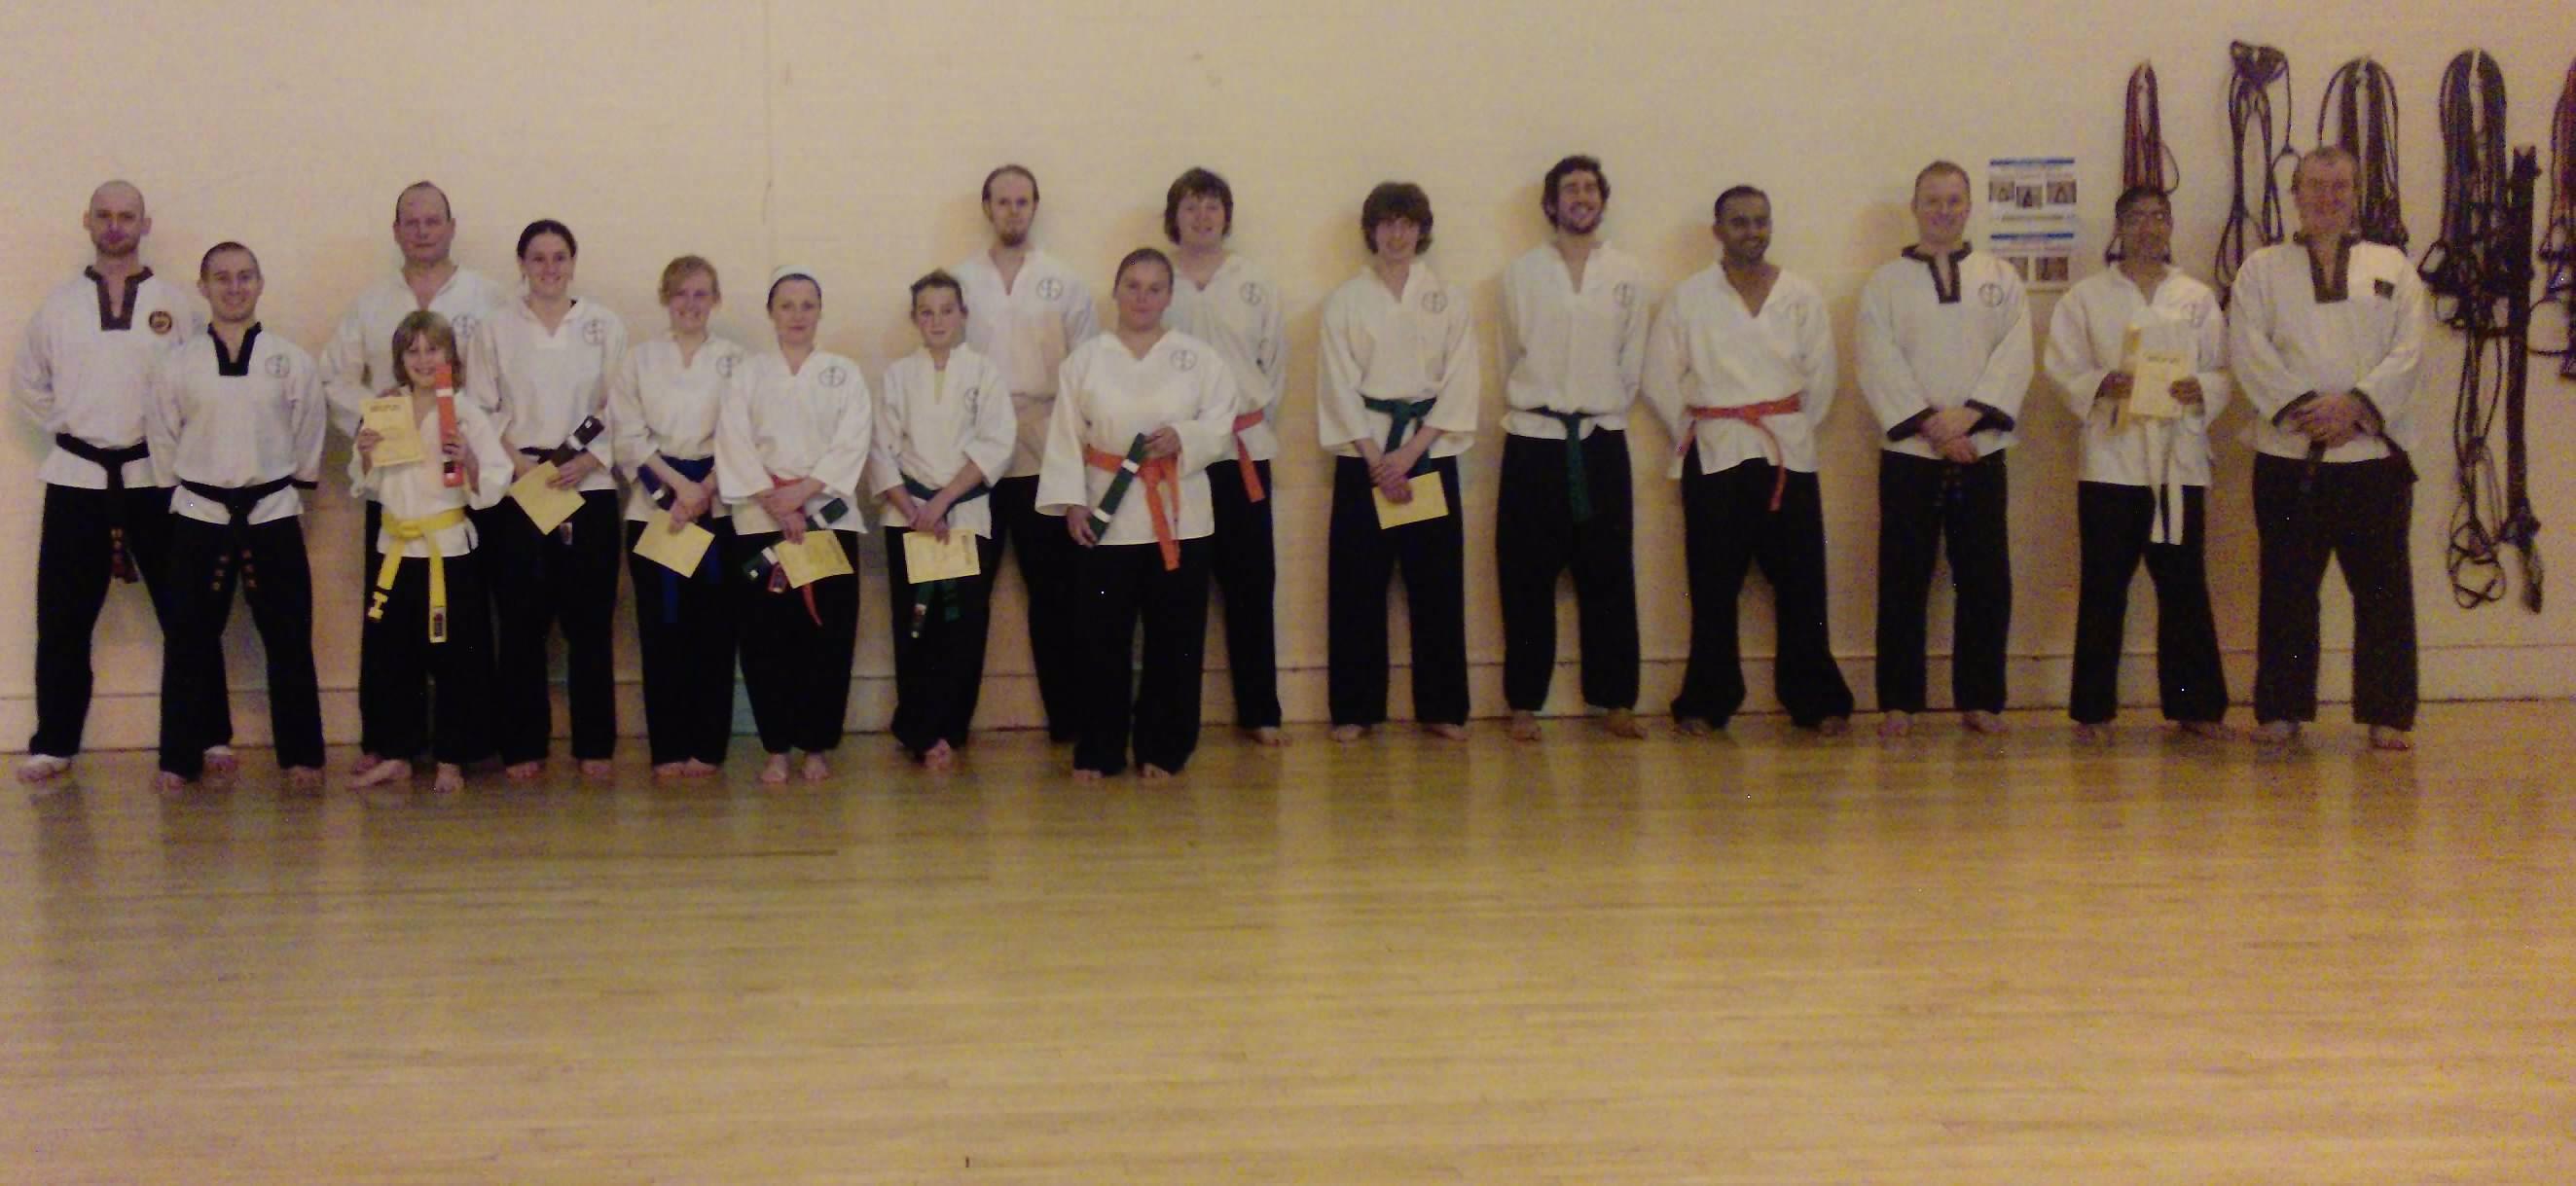 goyararu martial arts grading candidates NOV 2009